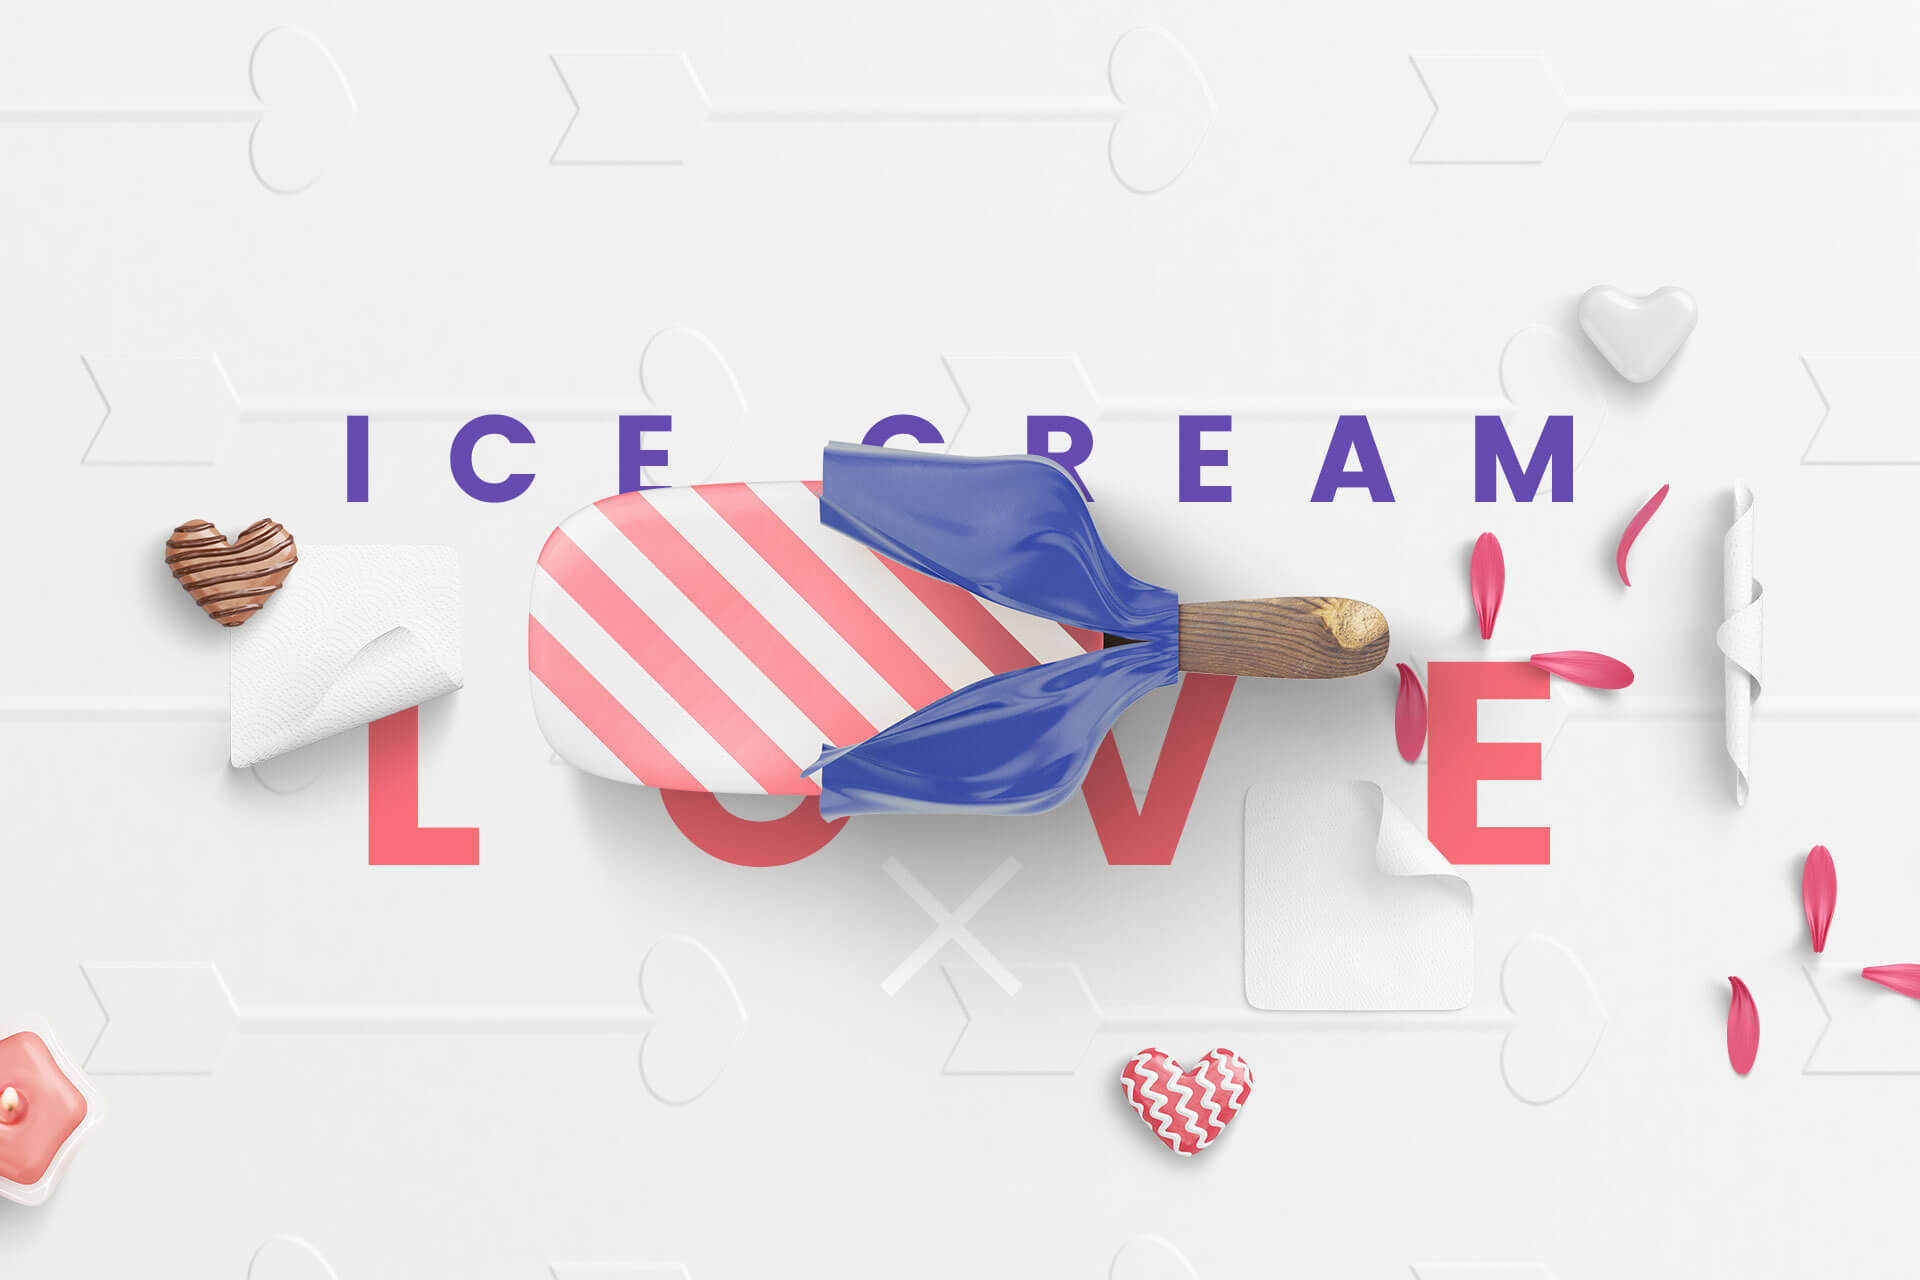 Dox Ice Cream Love